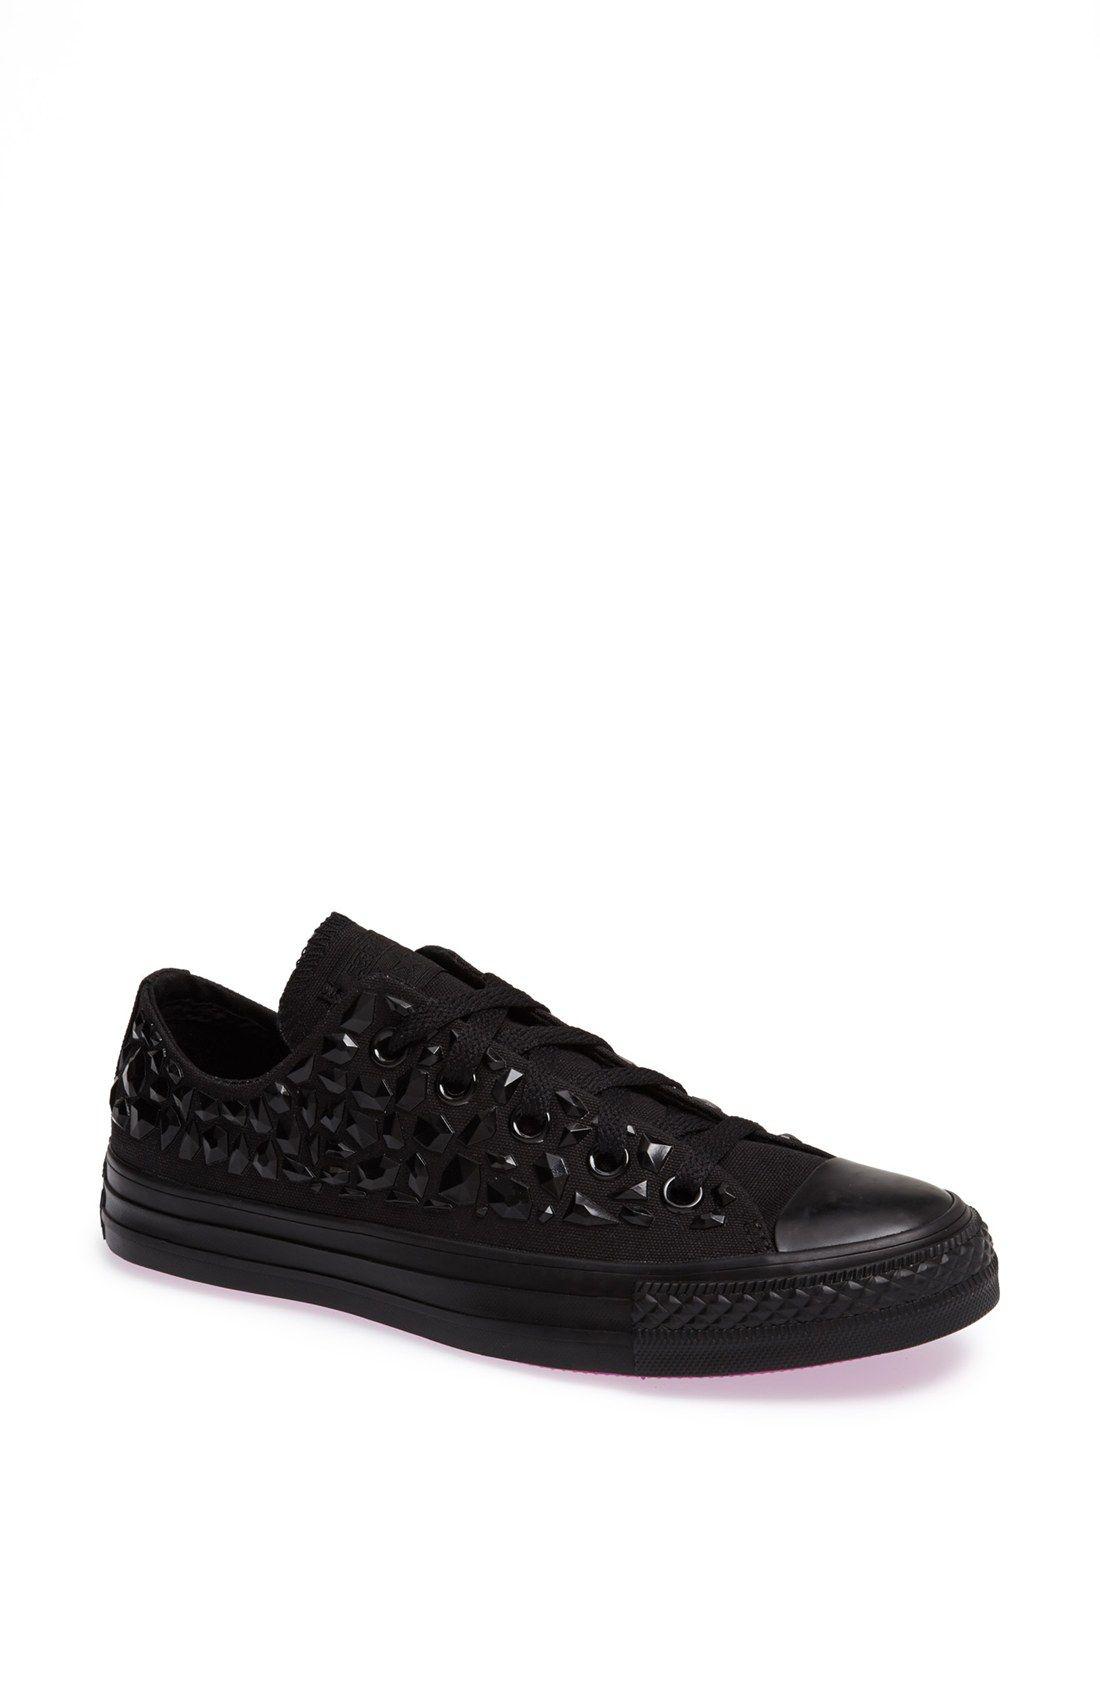 64149379c7c9 Converse Chuck Taylor® All Star®  Rhinestone  Sneaker (Women ...